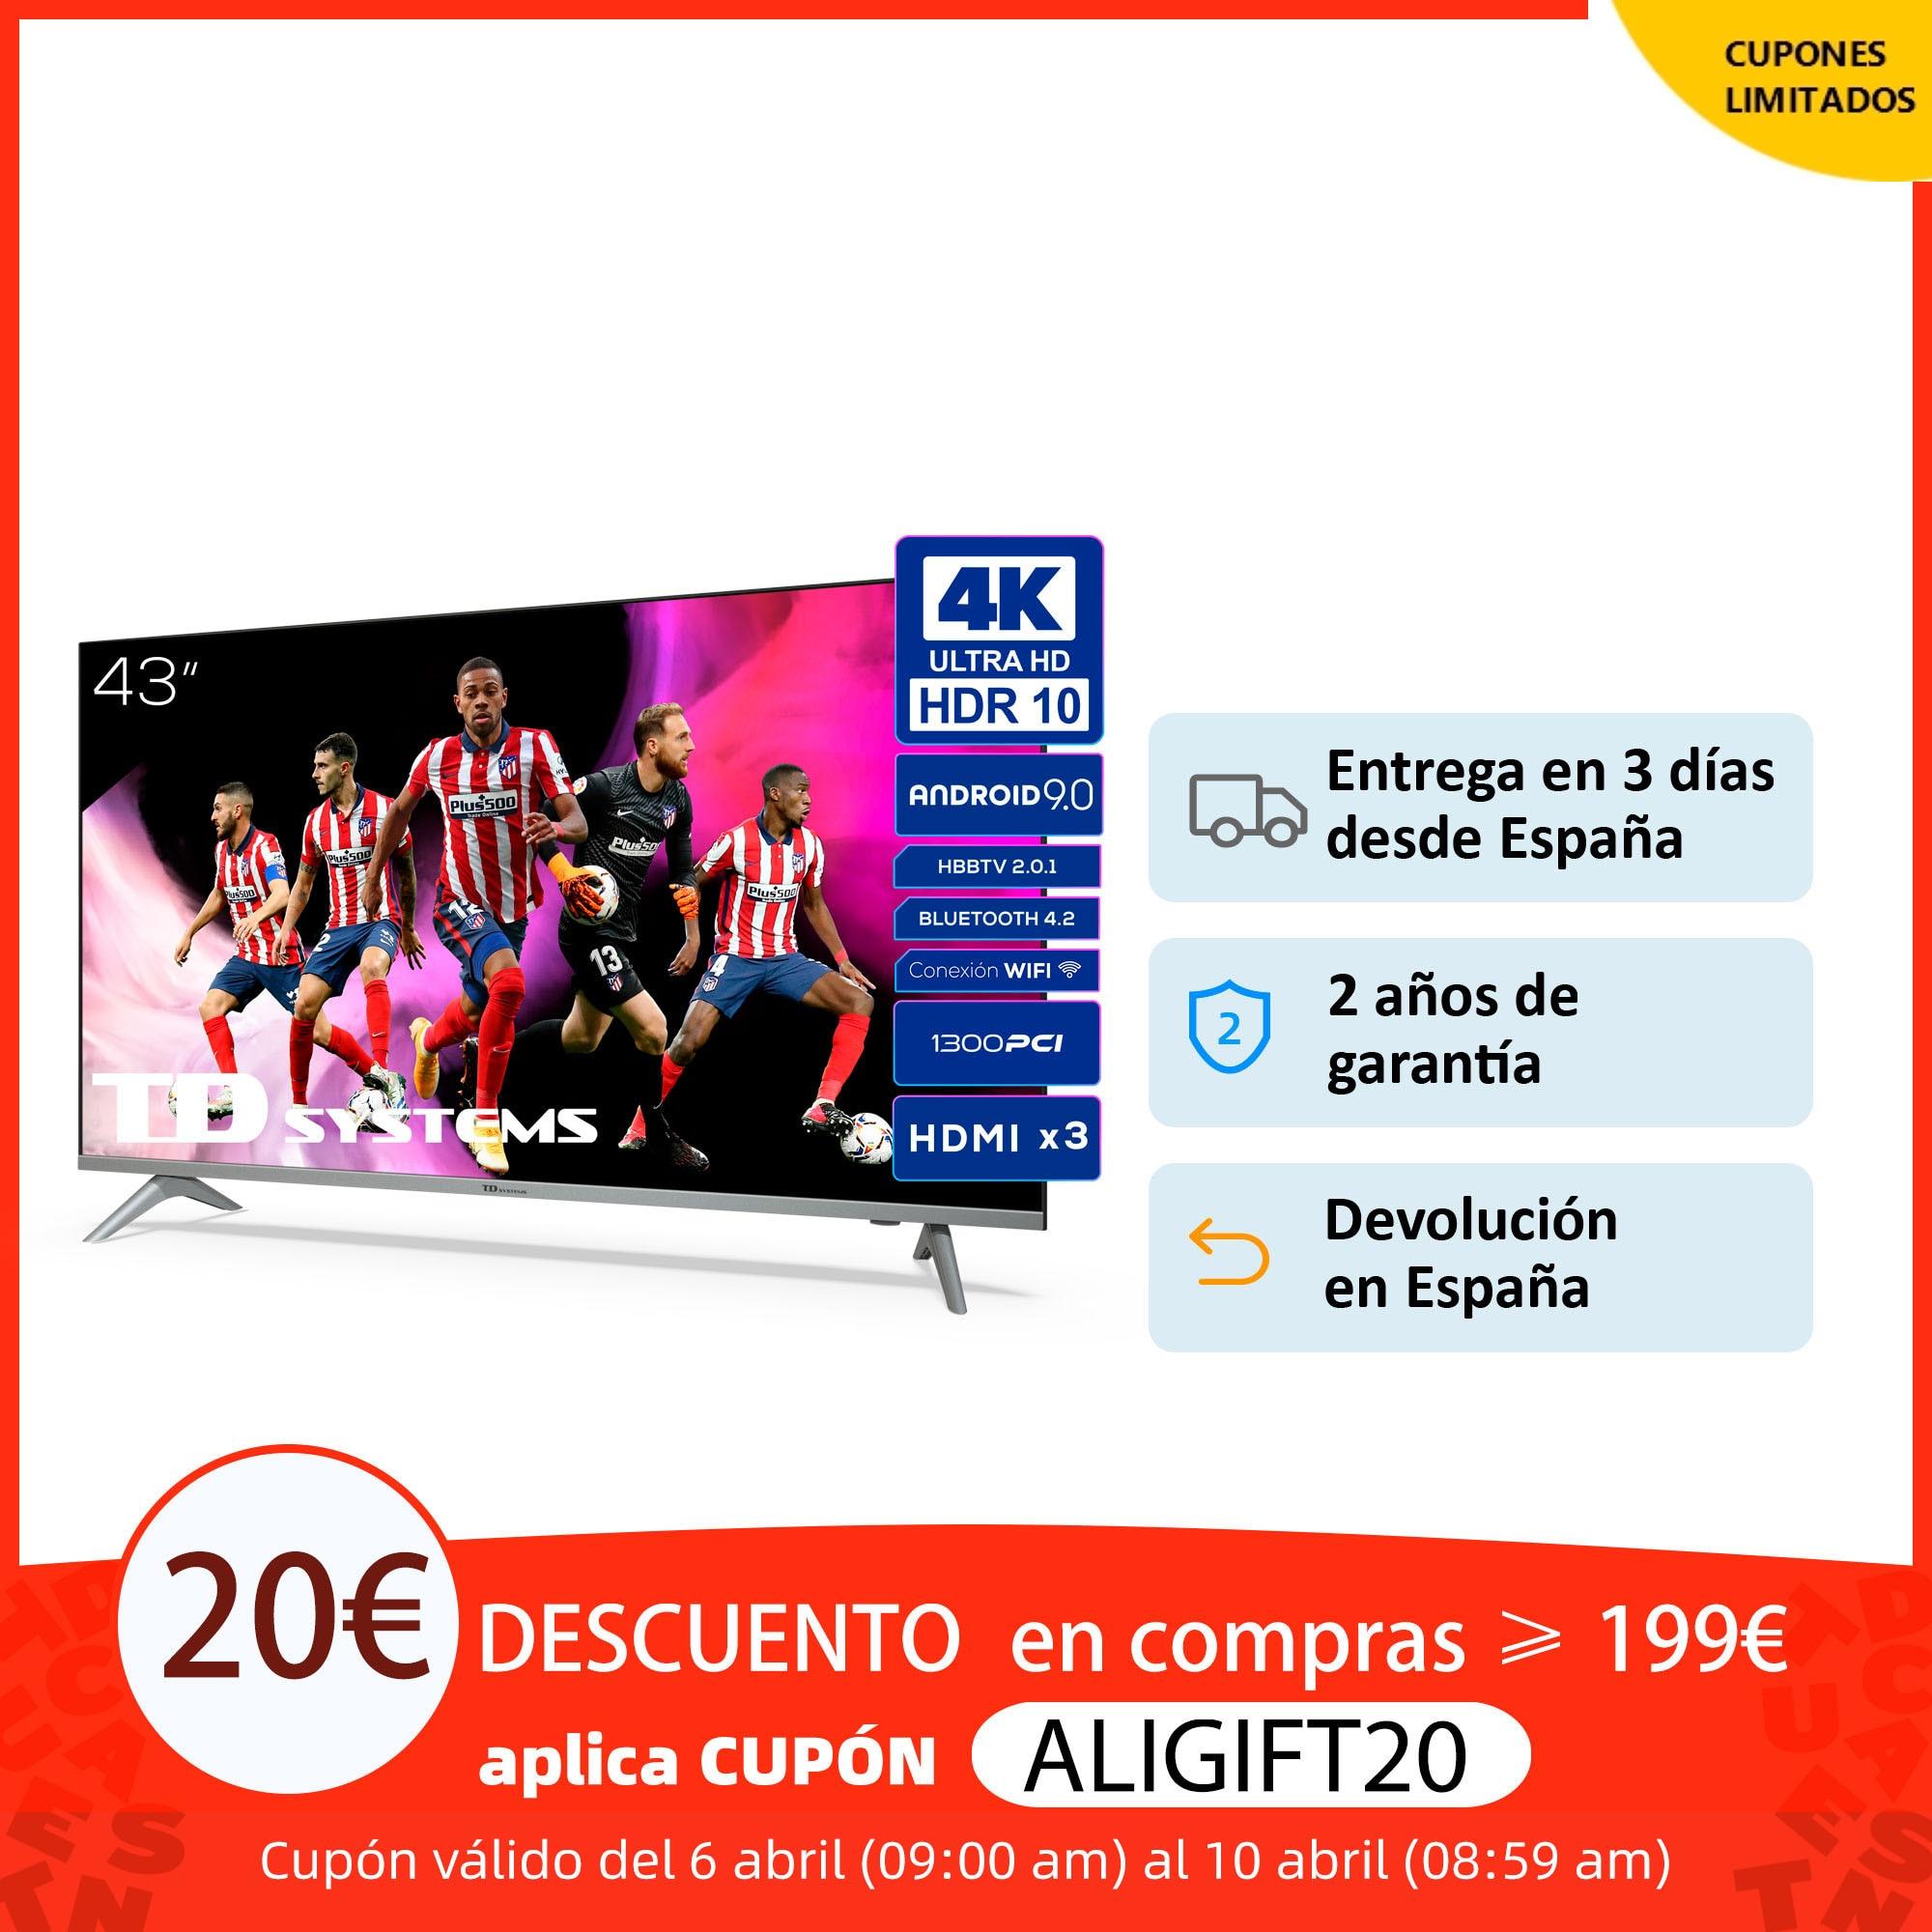 Televisores Smart TV 43 Pulgadas TD Systems K43DLX11US. UHD 4K HDR, DVB T2/C/S2, HbbTV [Envío desde España, garantía de 2 años] Smart TV  - AliExpress